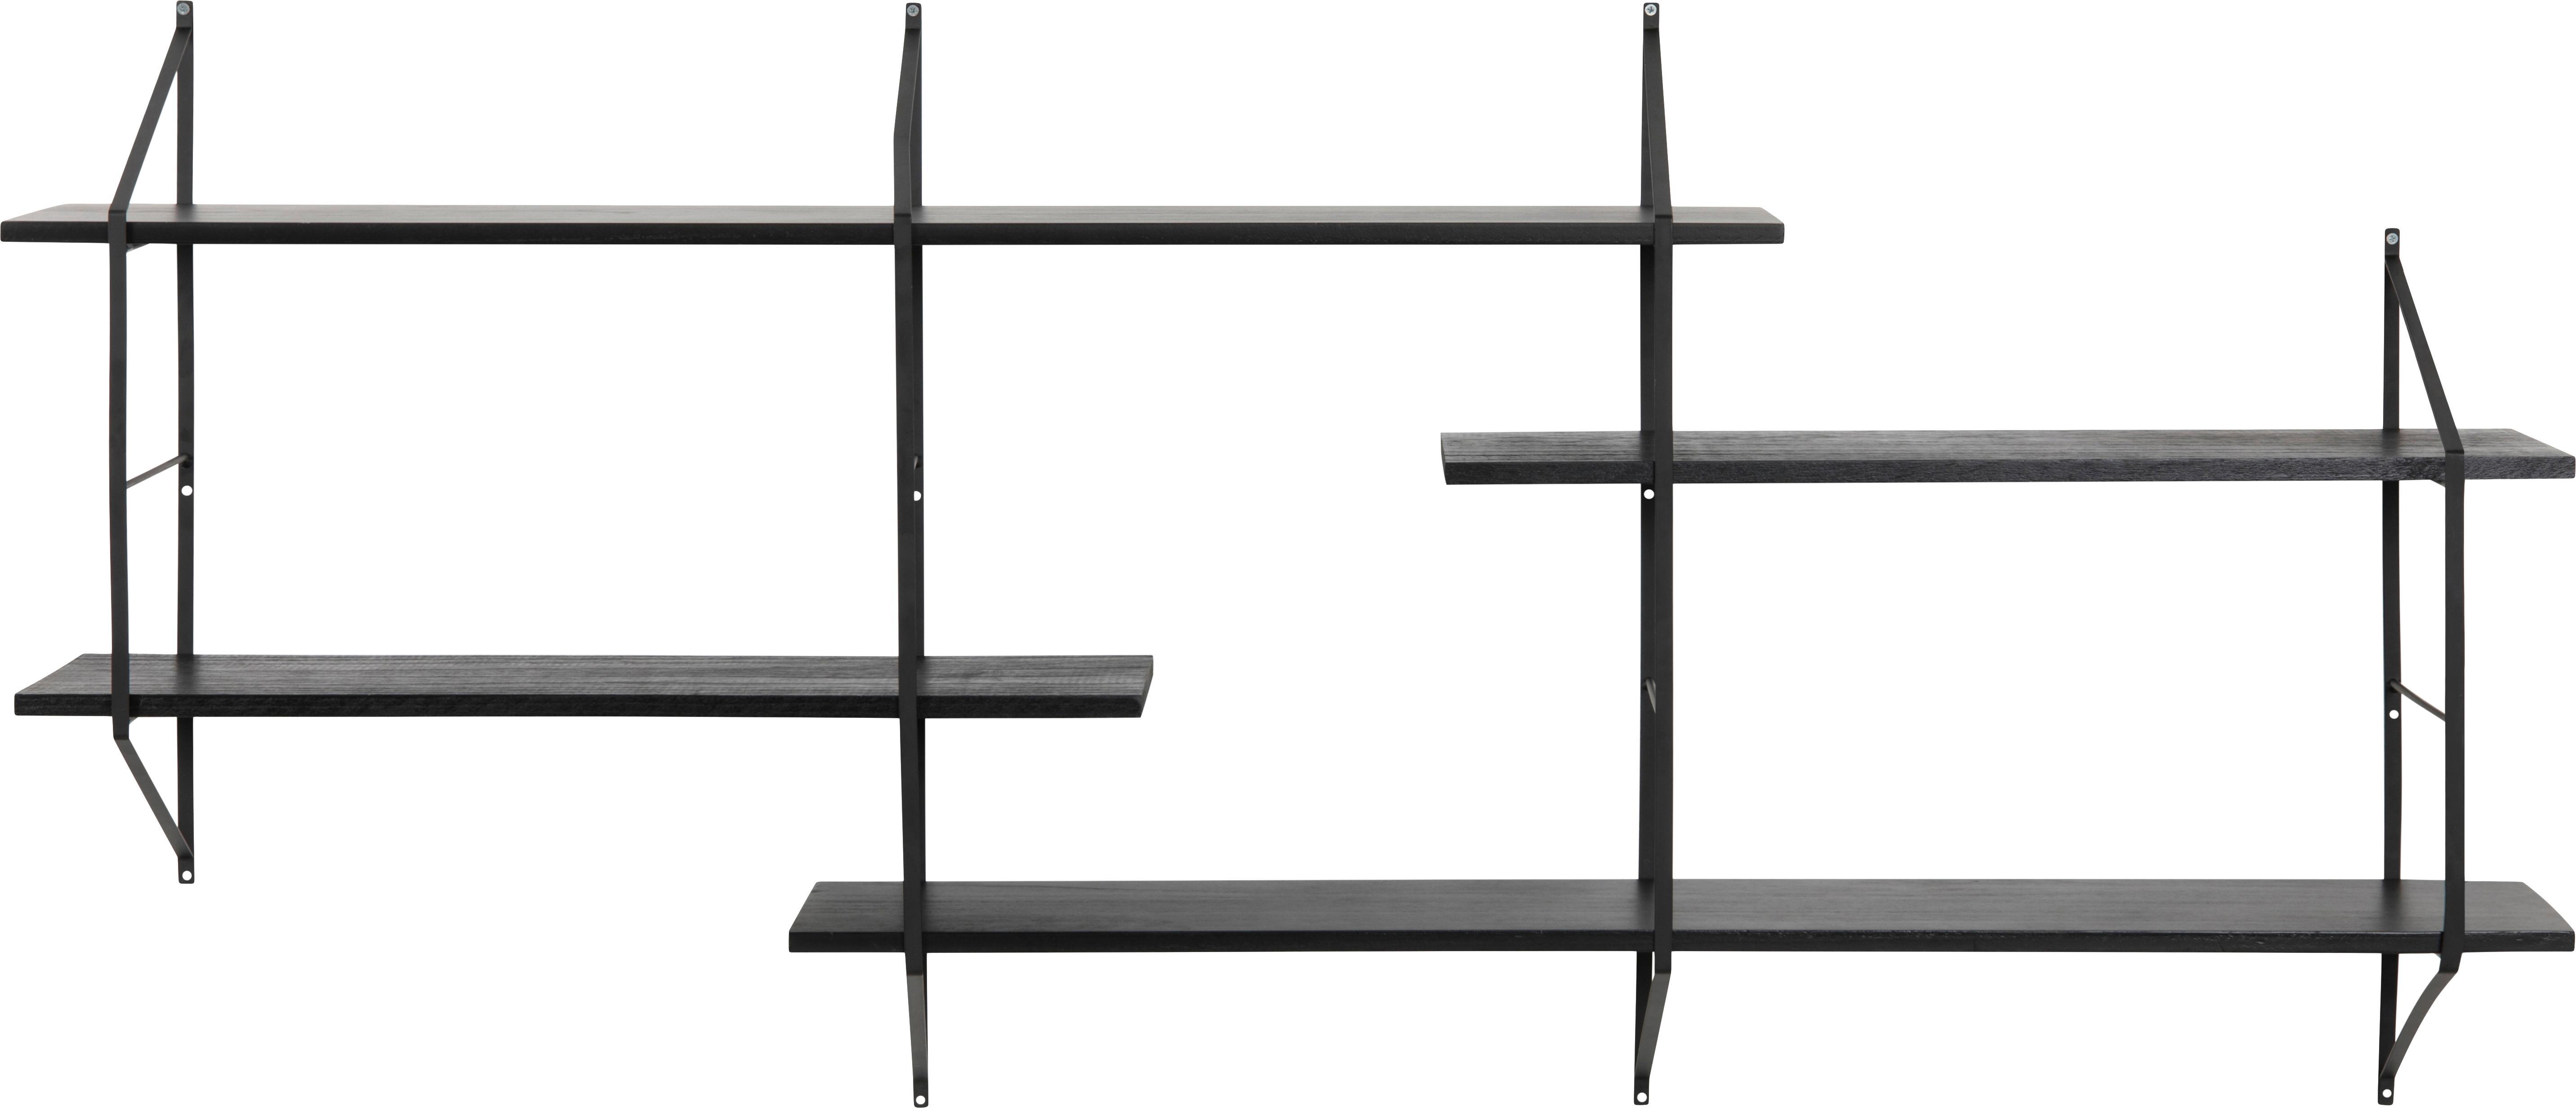 Wandregal Belfast aus Holz und Metall, Gestell: Metall, pulverbeschichtet, Schwarz, 191 x 79 cm